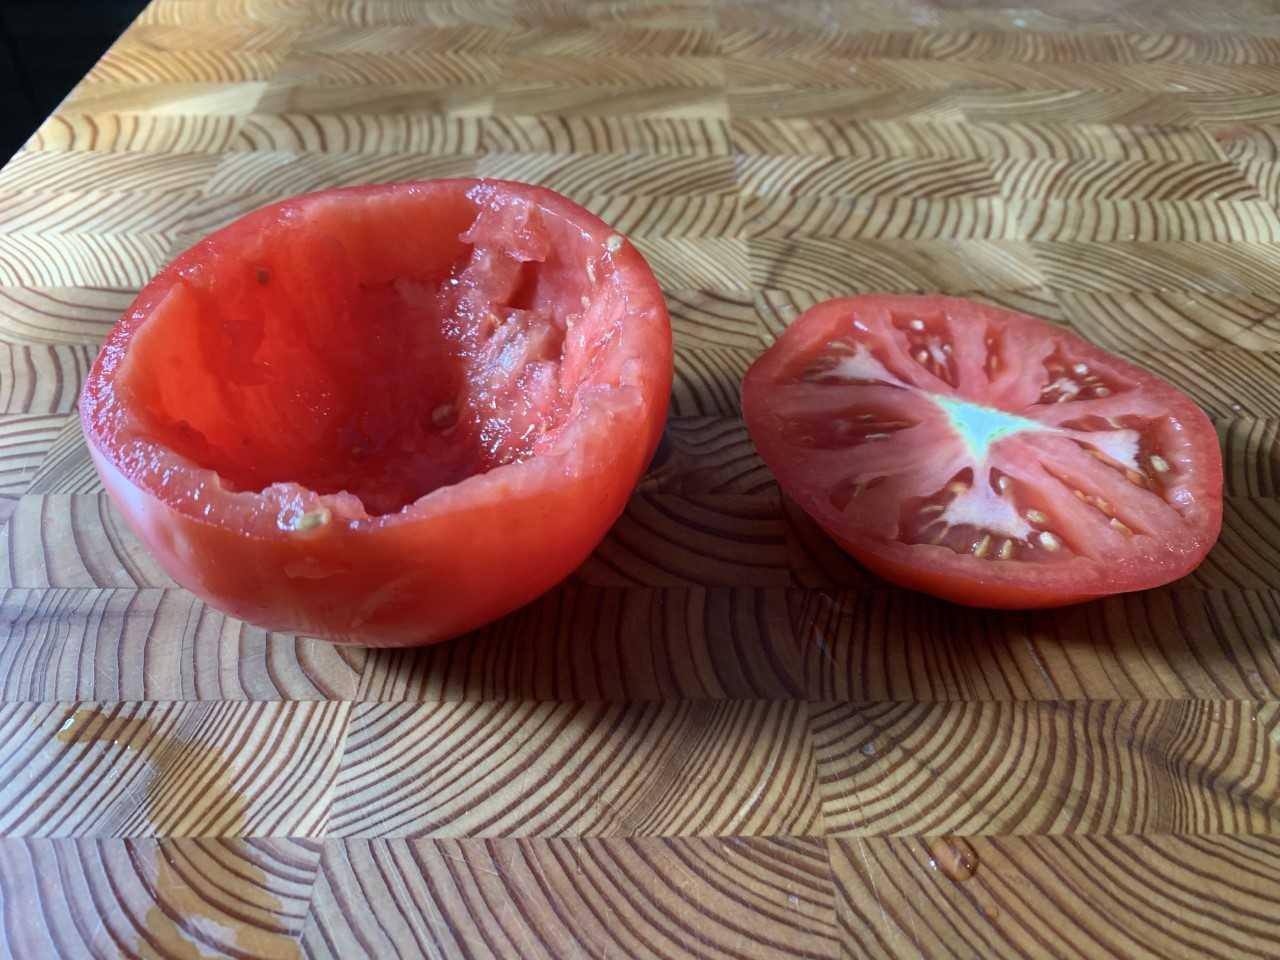 stuffed tomato.jpg